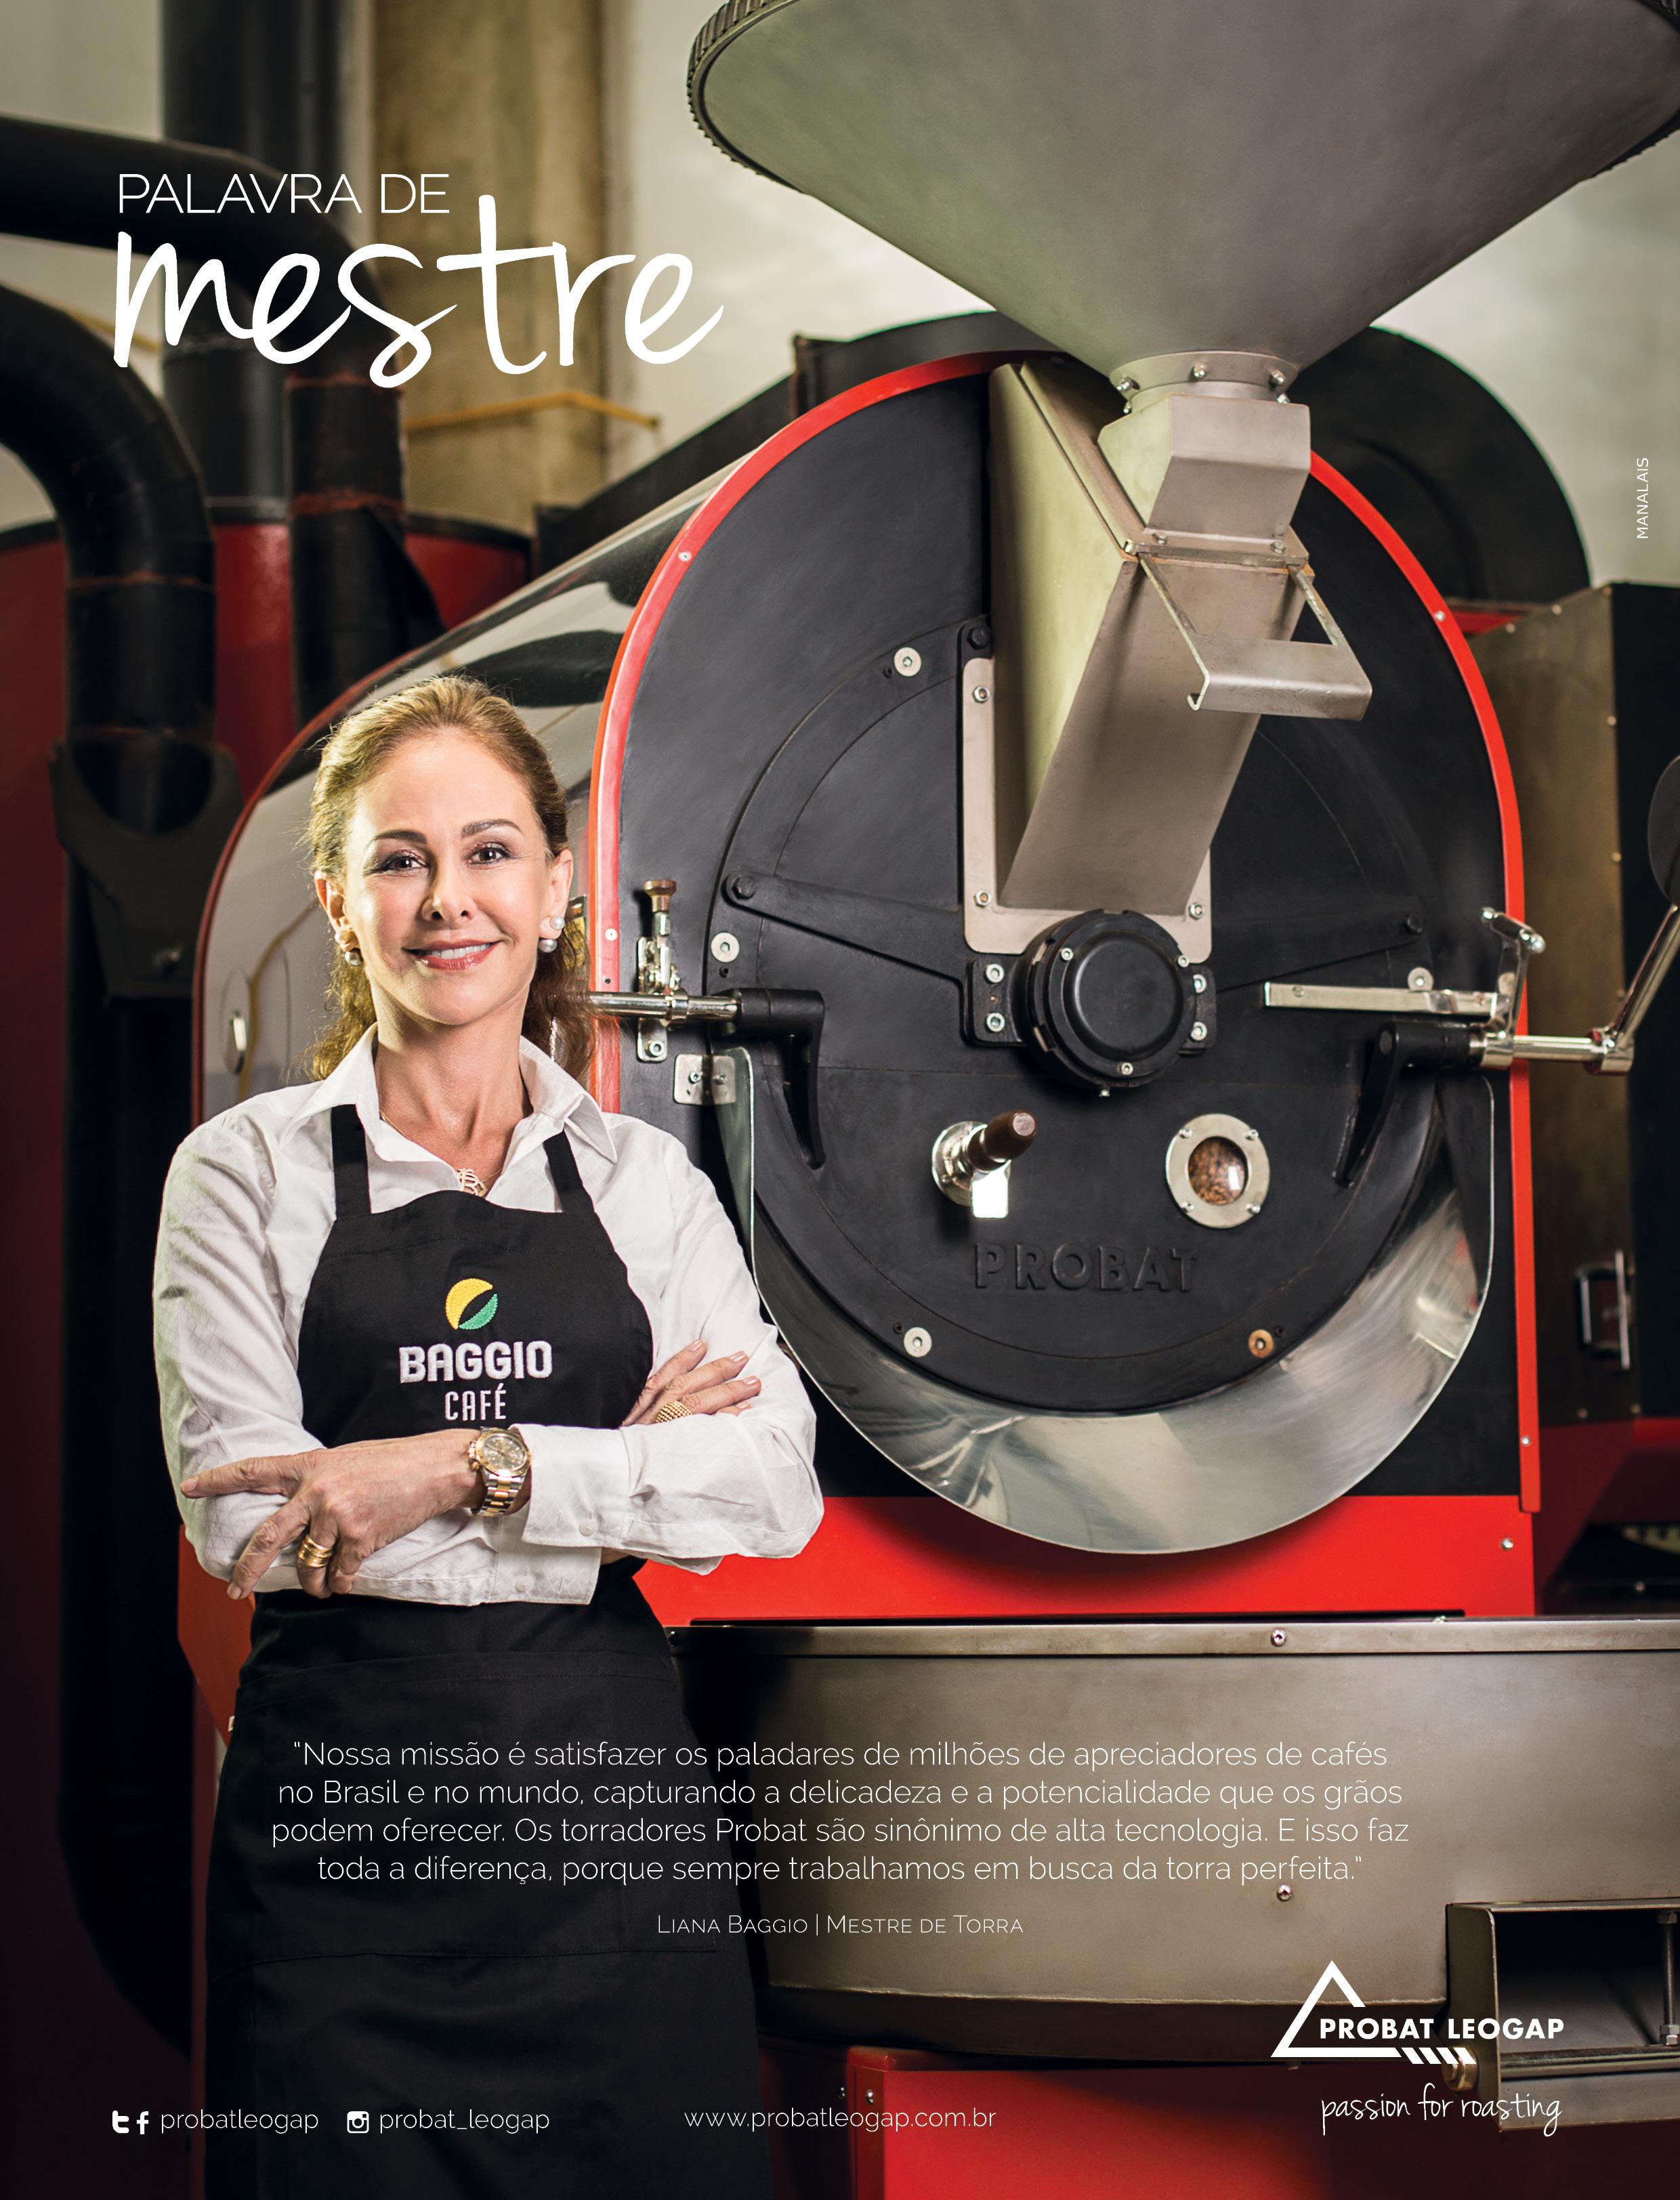 Palavra de Mestre - Baggio Cafés